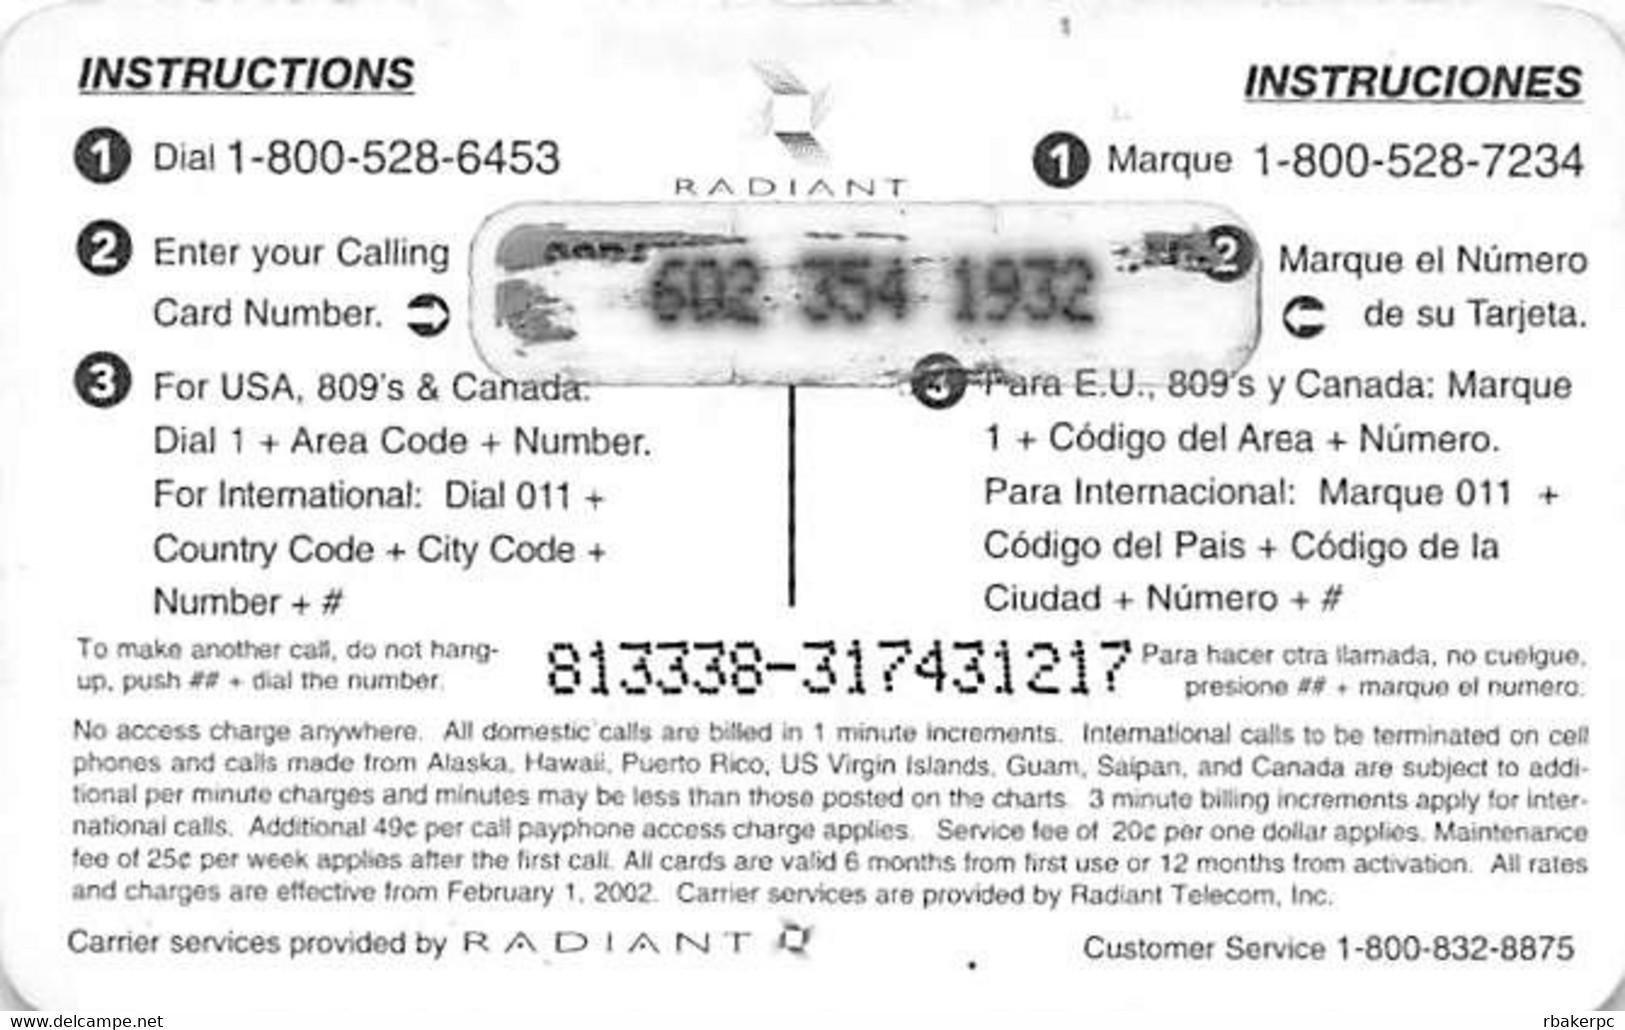 Radiant - No Surcharge USA $5 Phone Card - Telecom Operators